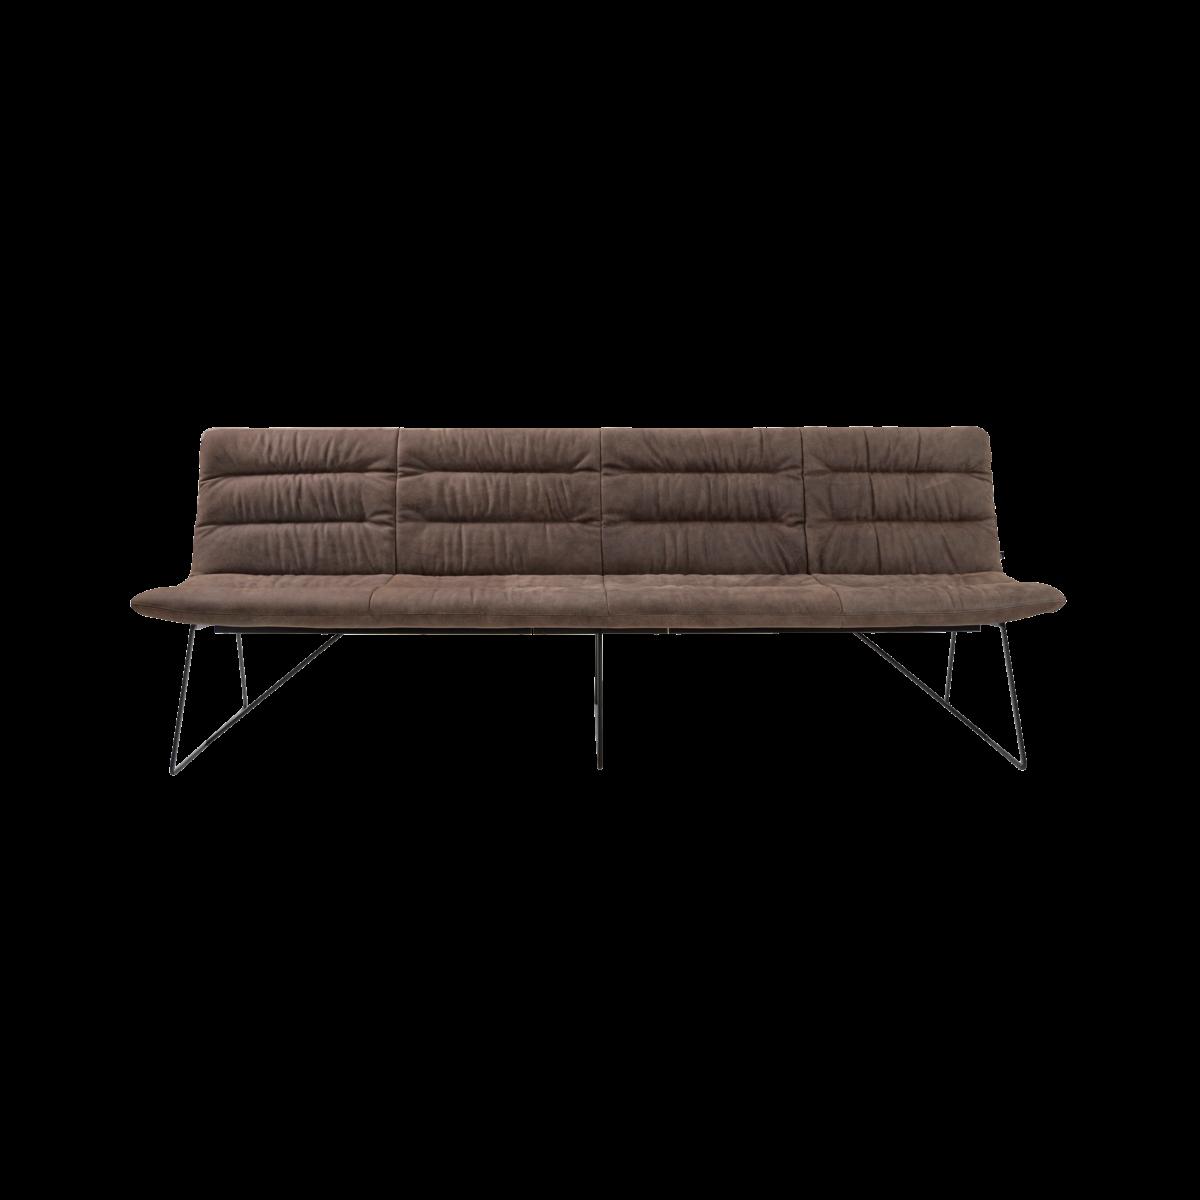 ARVA LIGHT BENCH 4er bench kuf oA pol brown KFF  0 1200x1200 - Bancheta Arva Light KFF